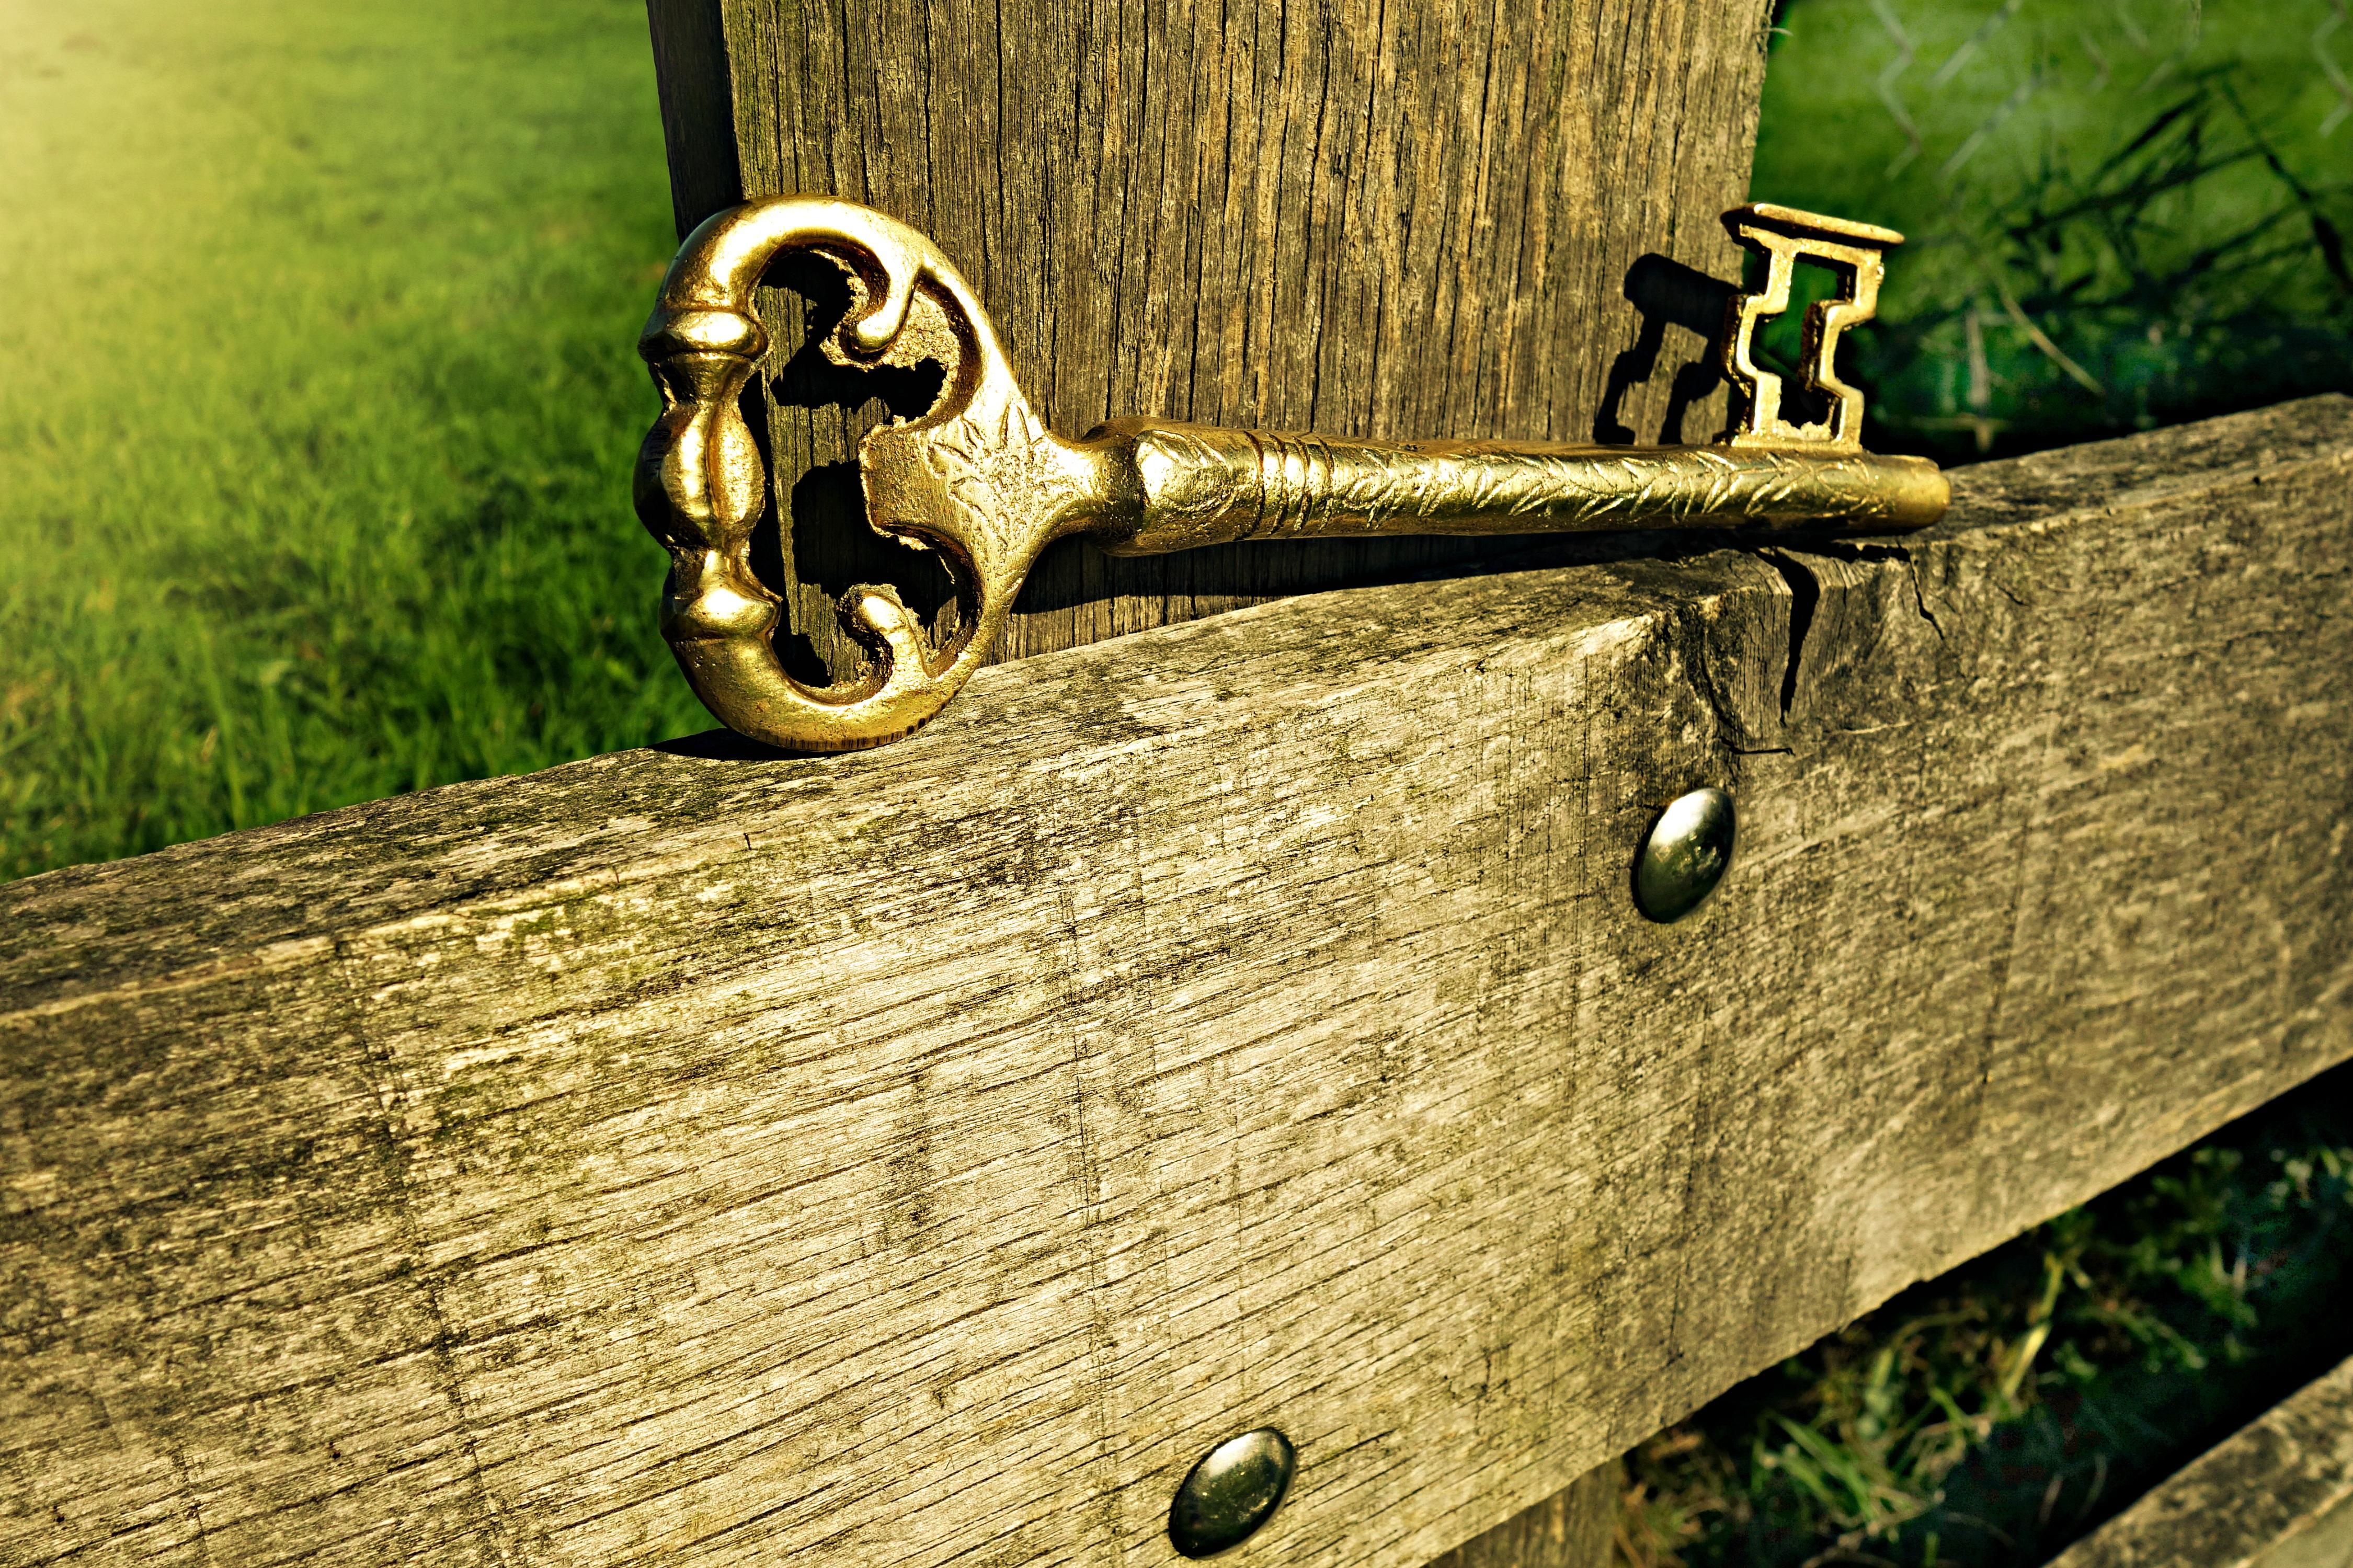 Free Images : open, wood, vintage, antique, green, entrance, metal ...